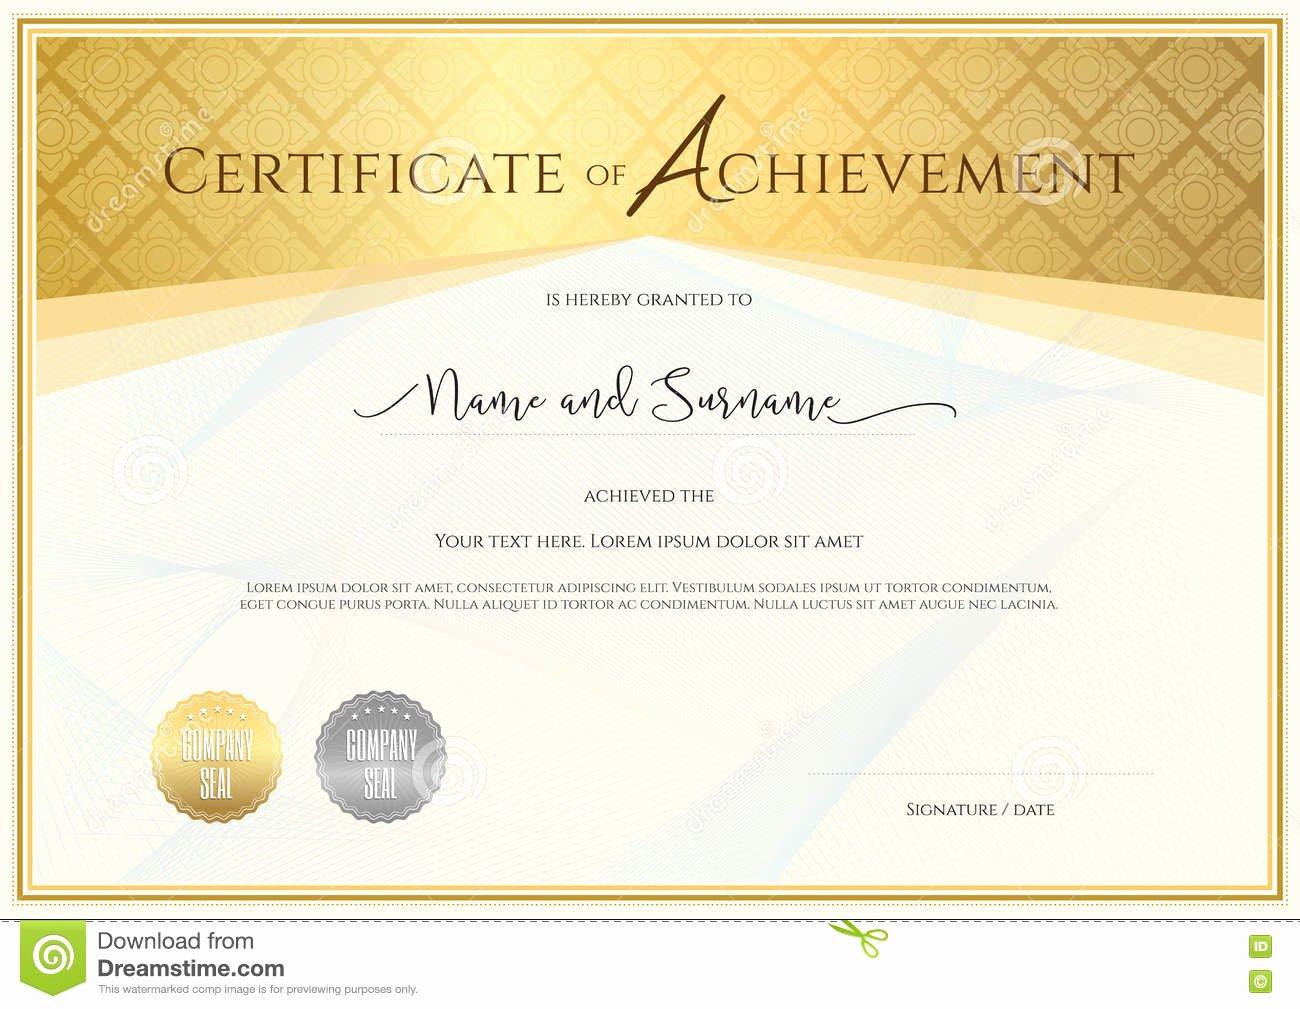 Certificate Of Satisfaction Template Beautiful Certificate Template for Achievement Appreciation